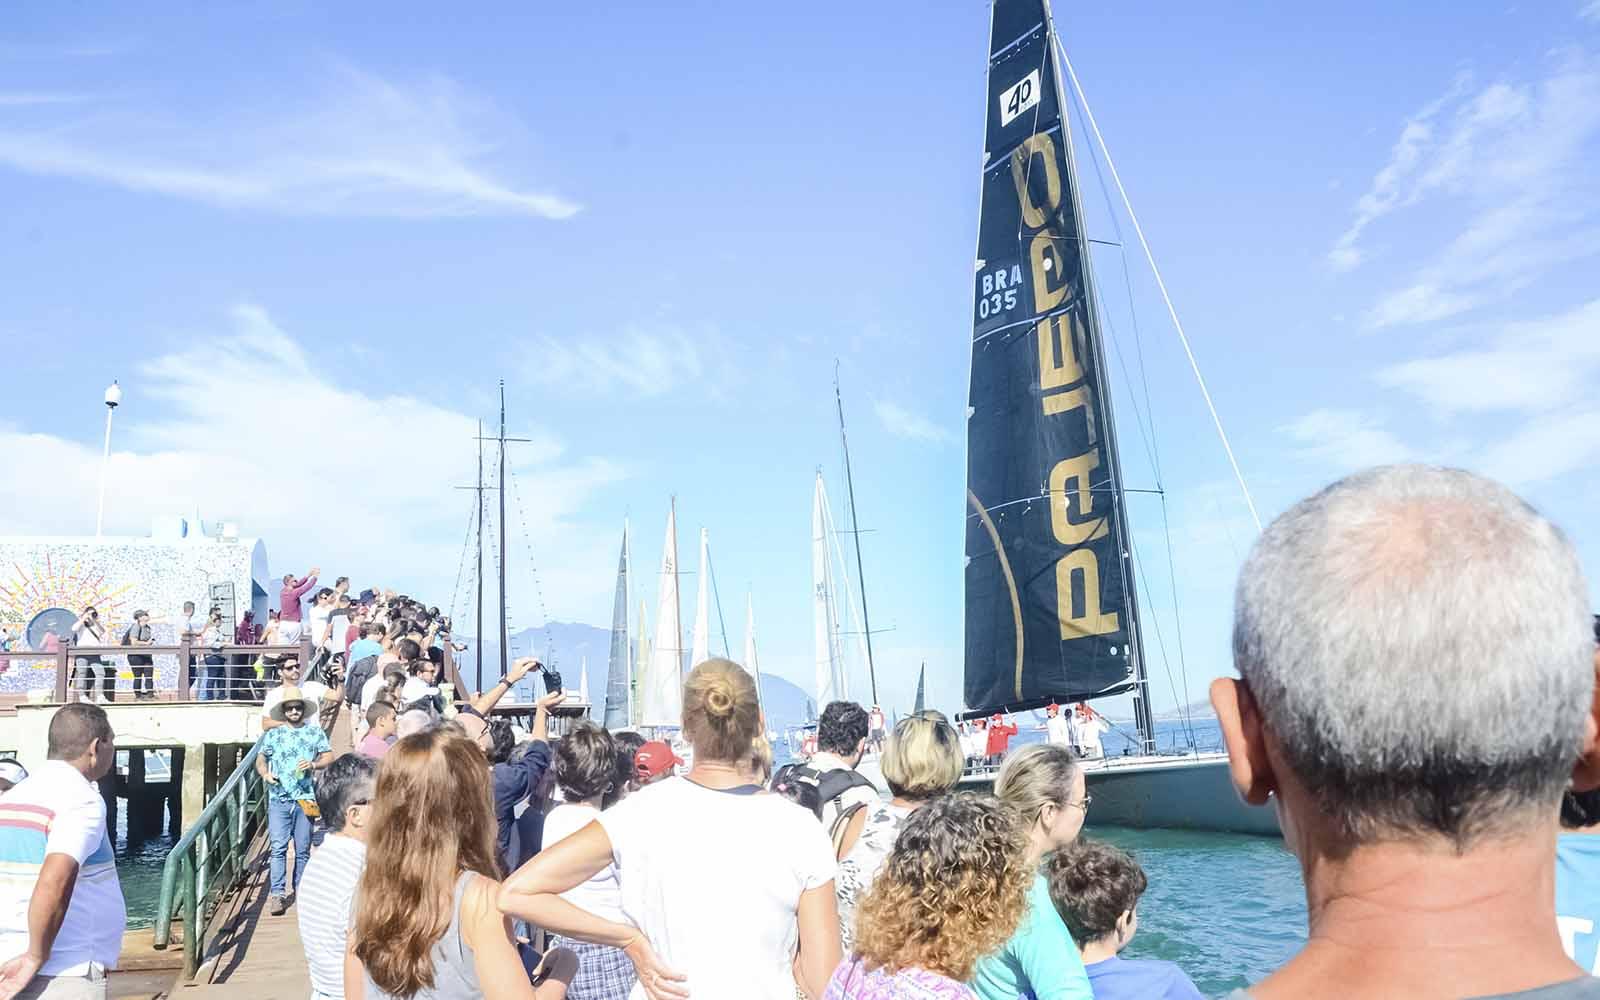 semana internacional de vela de ilhabela - boat shopping